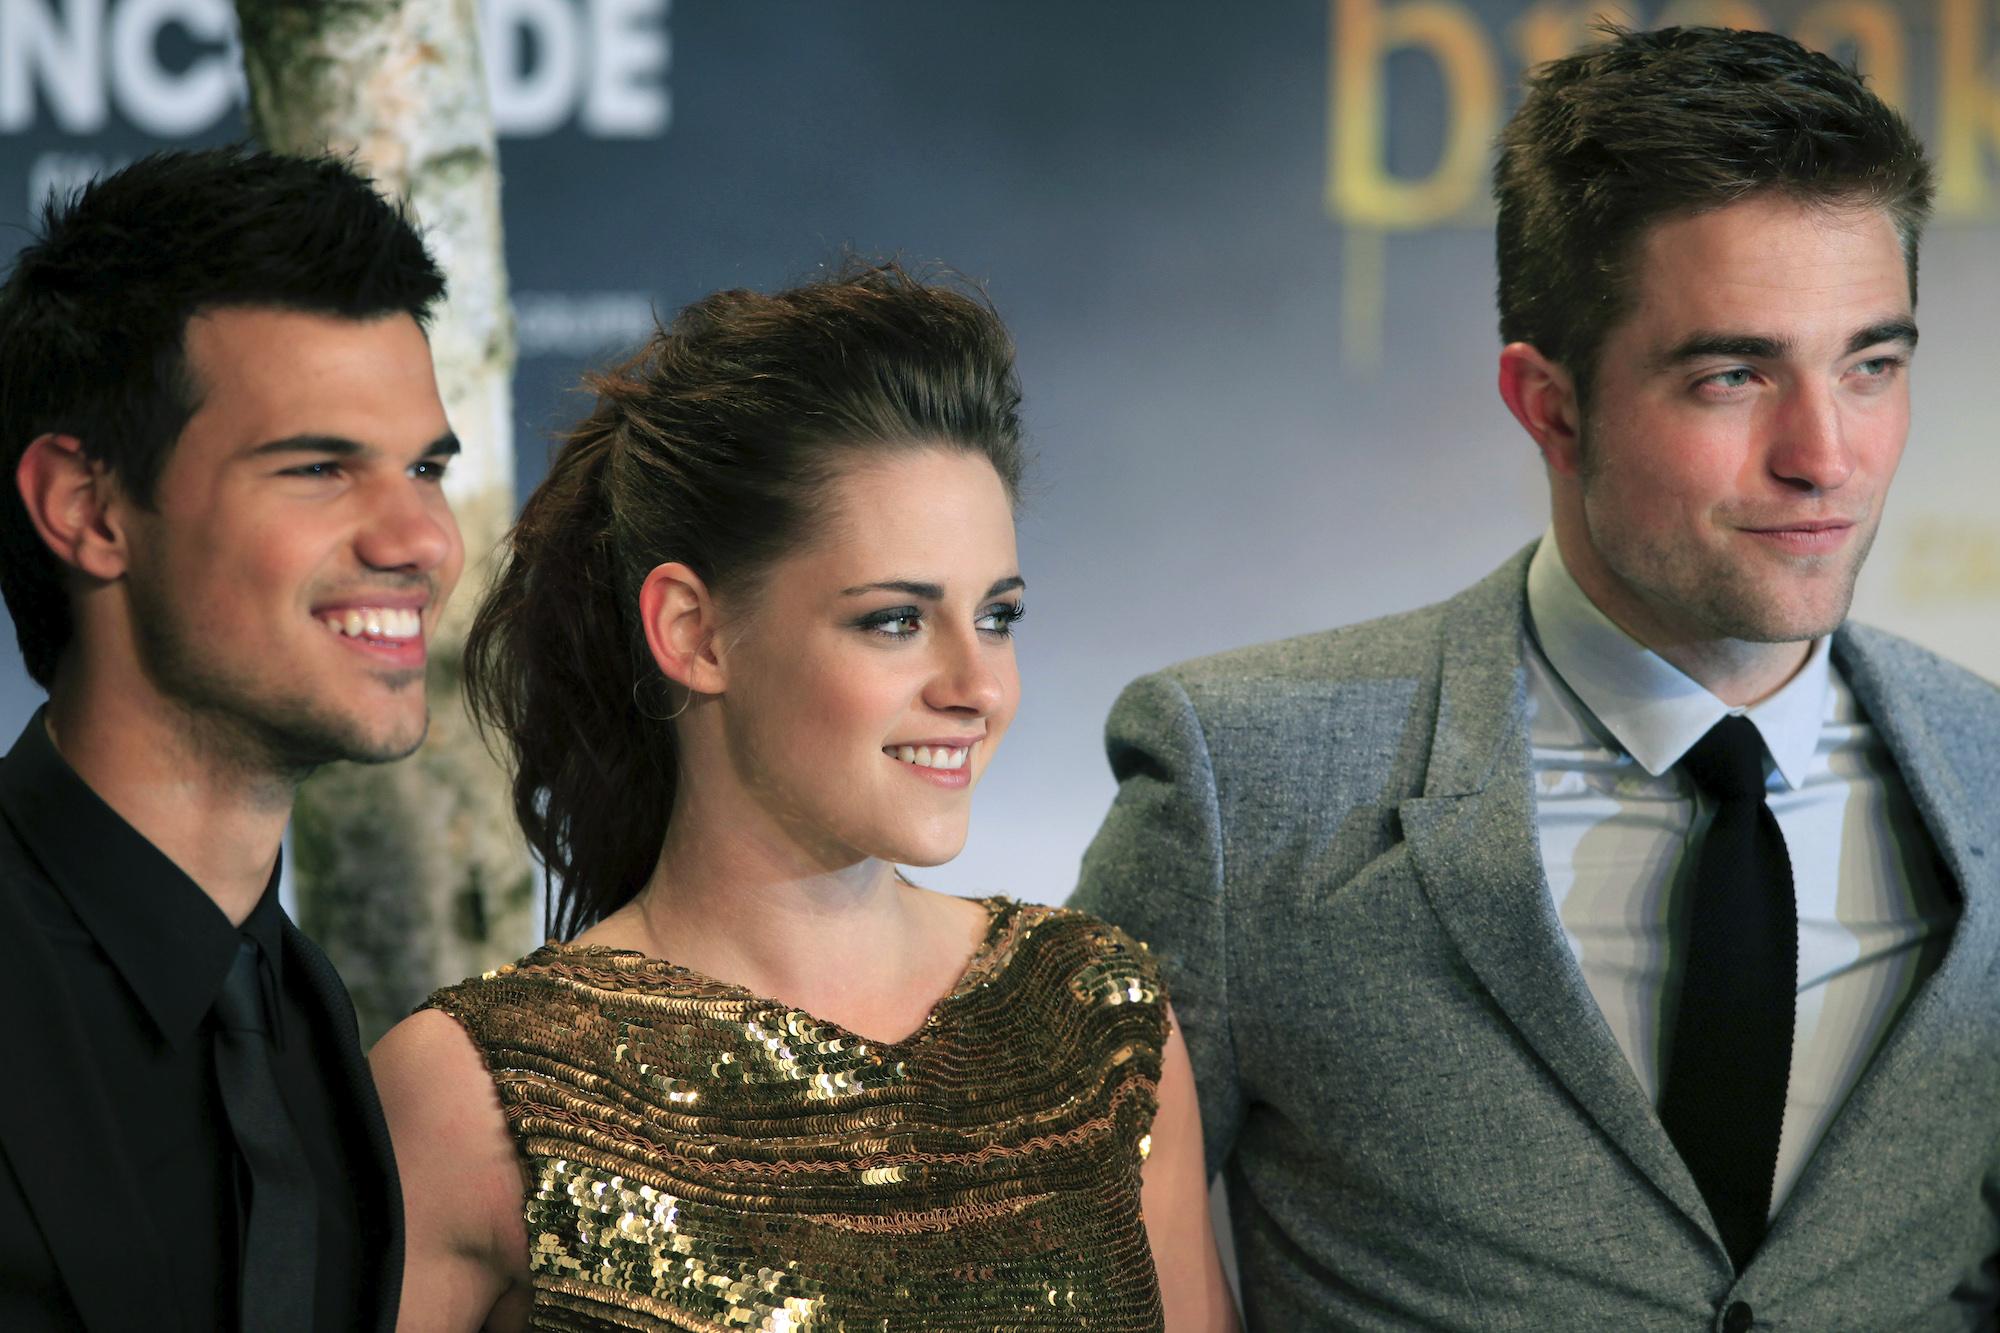 Taylor Lautner, Kristen Stewart, and Robert Pattinson at the German premiere of 'The Twilight Saga: Breaking Dawn - Part 2' on Nov. 16, 2012.